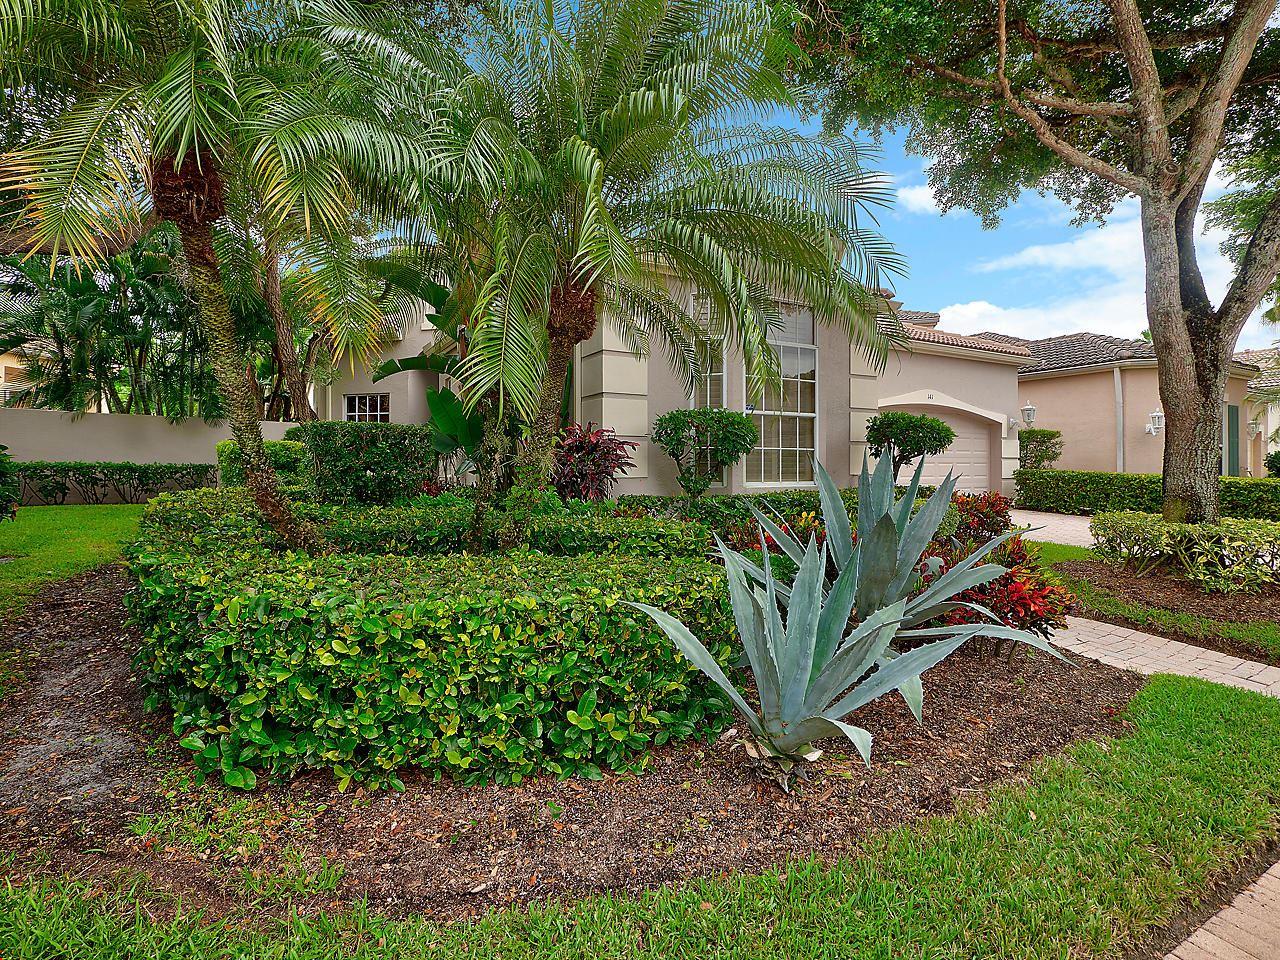 141 Sunset Bay Drive, Palm Beach Gardens, FL 33418 - #: RX-10567353